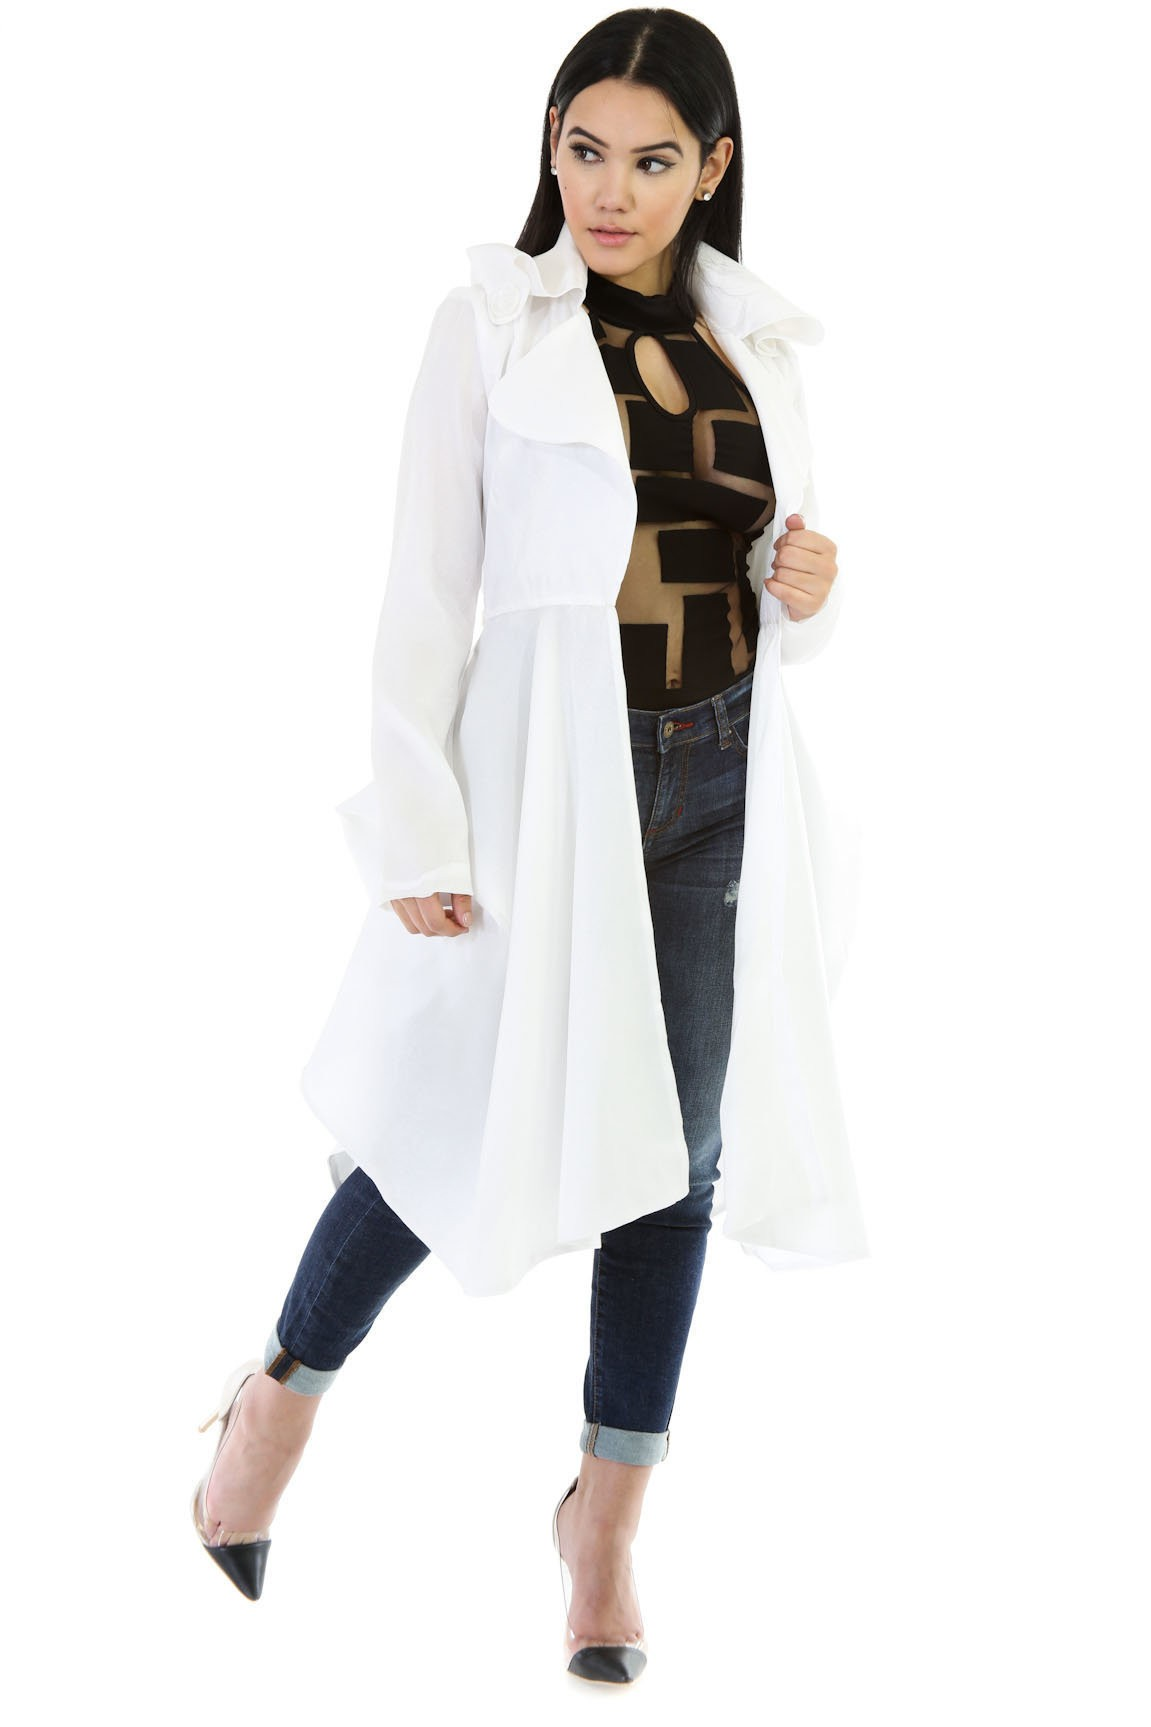 Dress-Coat In Style